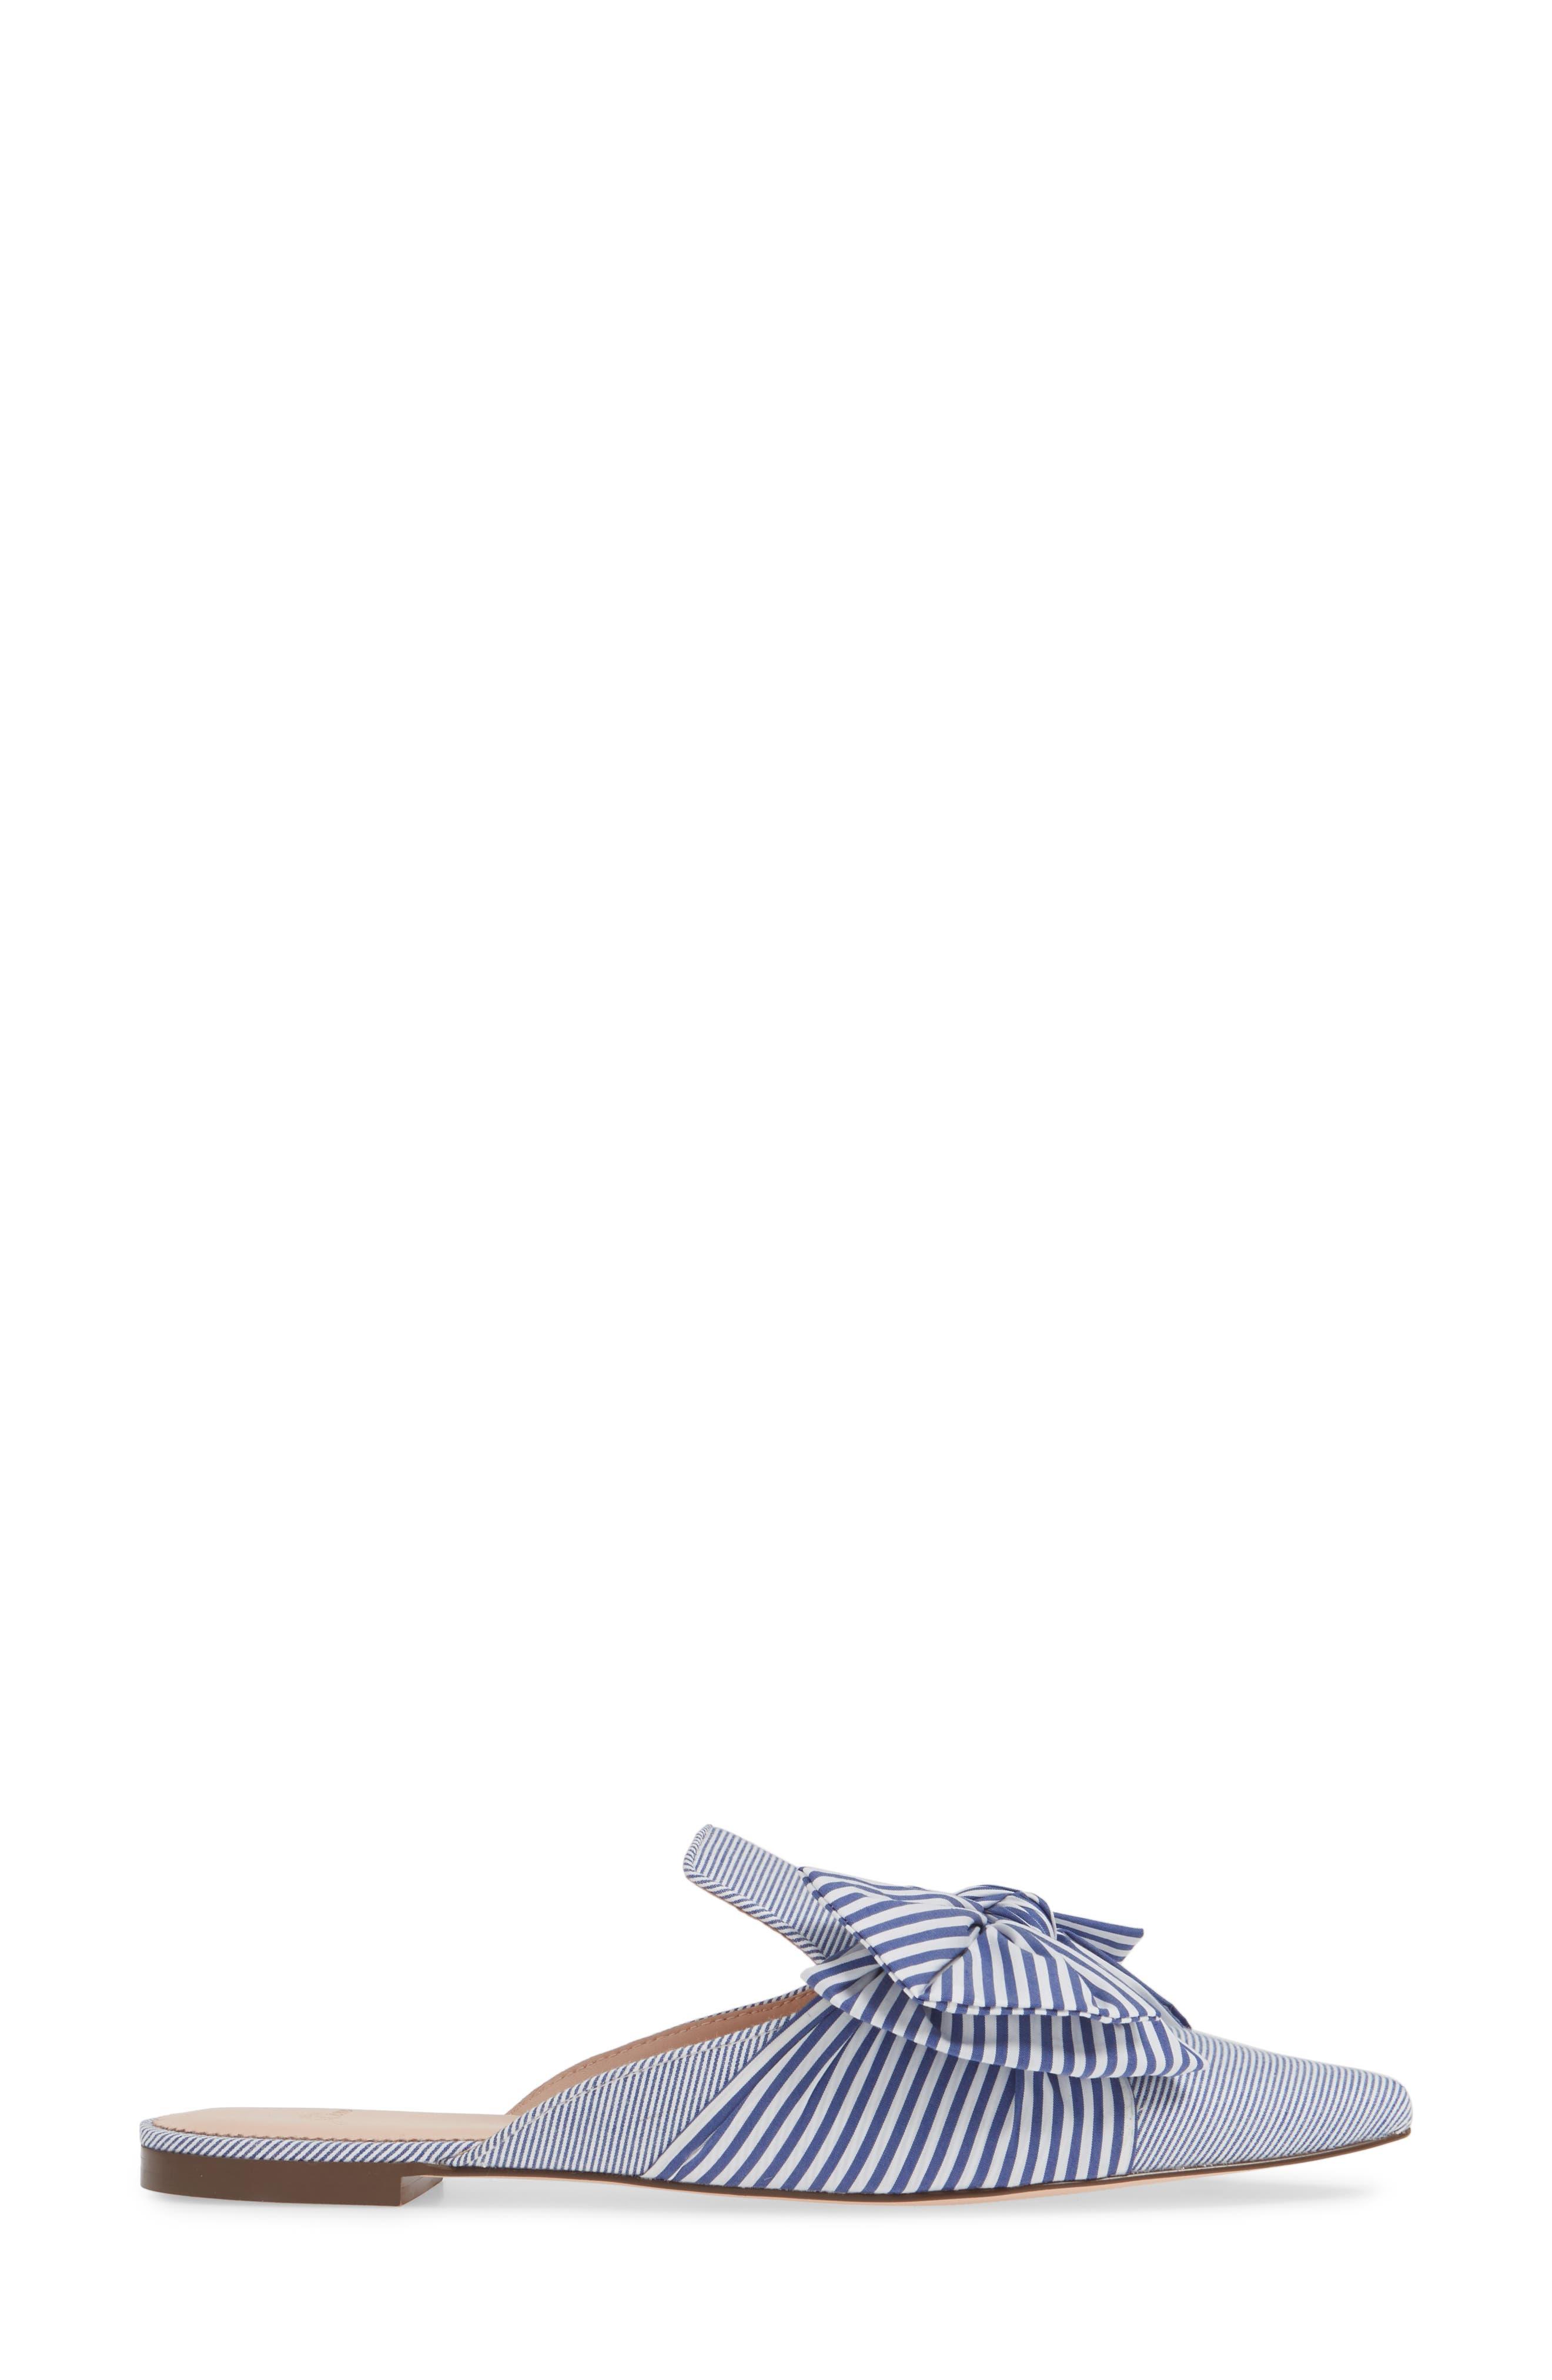 J.CREW, Pointed Toe Mule, Alternate thumbnail 3, color, OCEAN WHITE